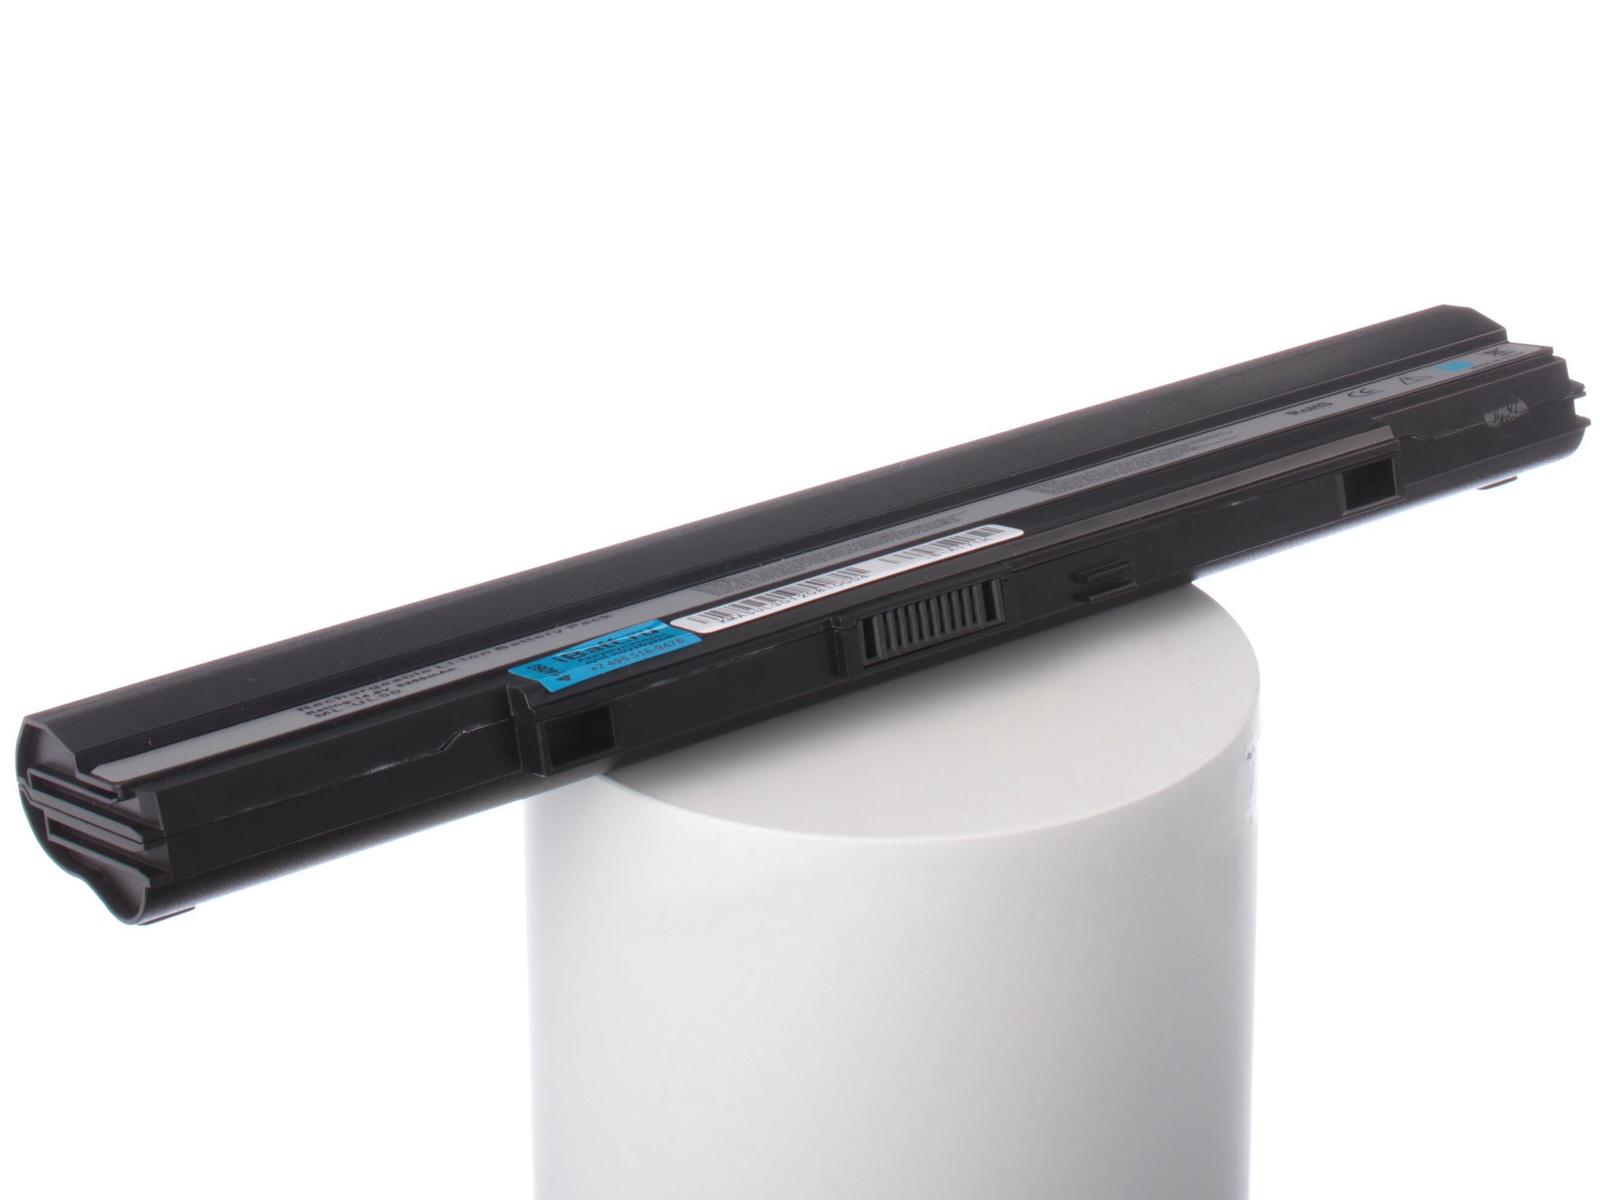 Аккумулятор для ноутбука iBatt Asus A42-UL50, A42-UL30, A32-U53, A42-UL80, A31-U53 a31 cpu